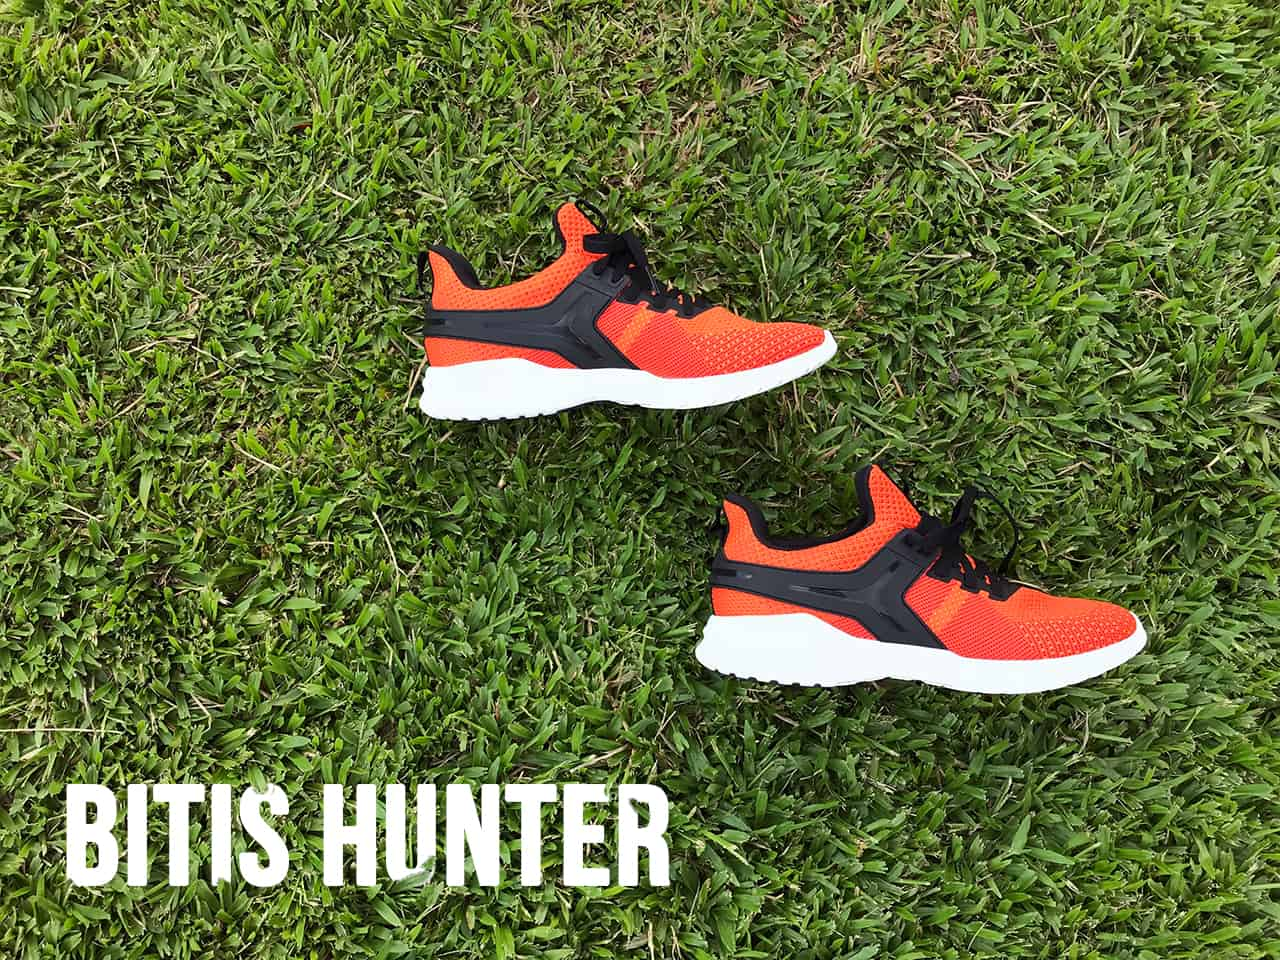 danh gia Bitis Hunter mới nhất Limited